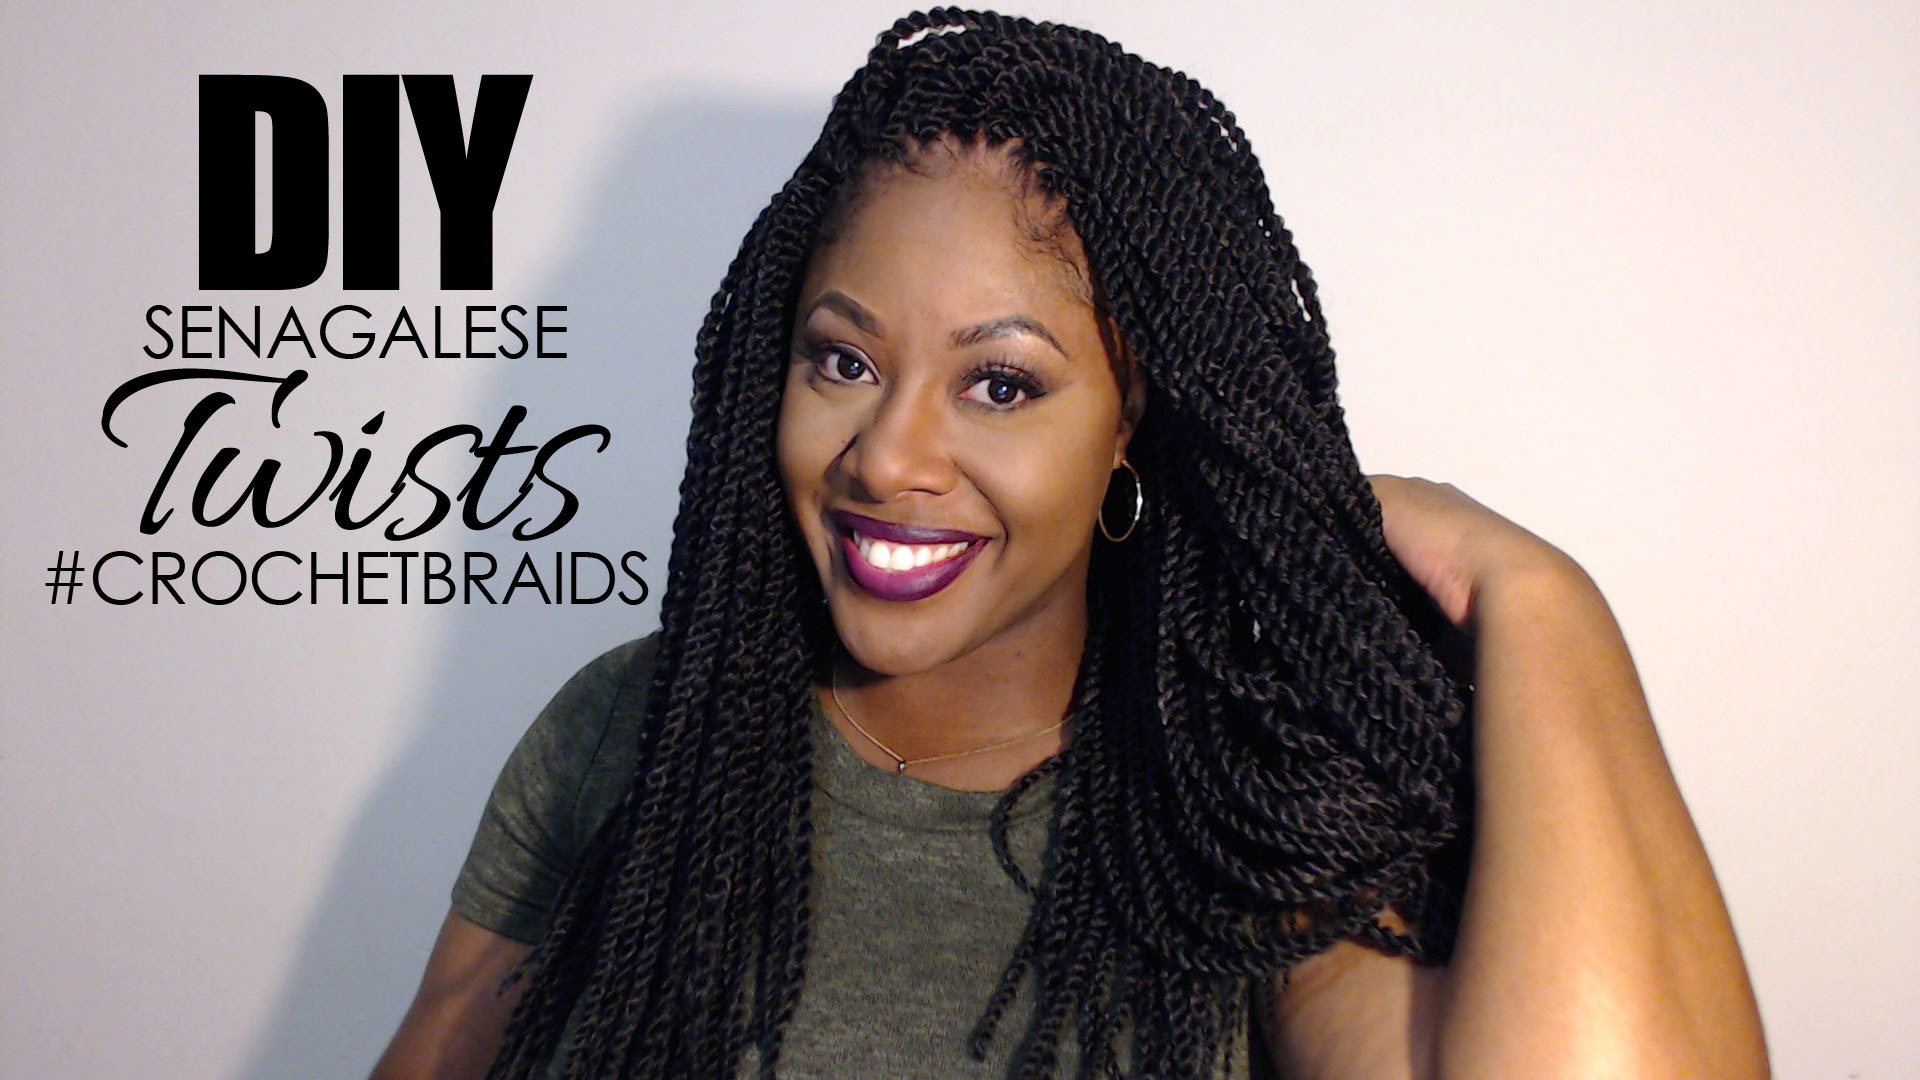 Senegalese Crochet Braids Hairstyles  Senegalese Twists Crochet Braids Braid – Makeup by Mesha